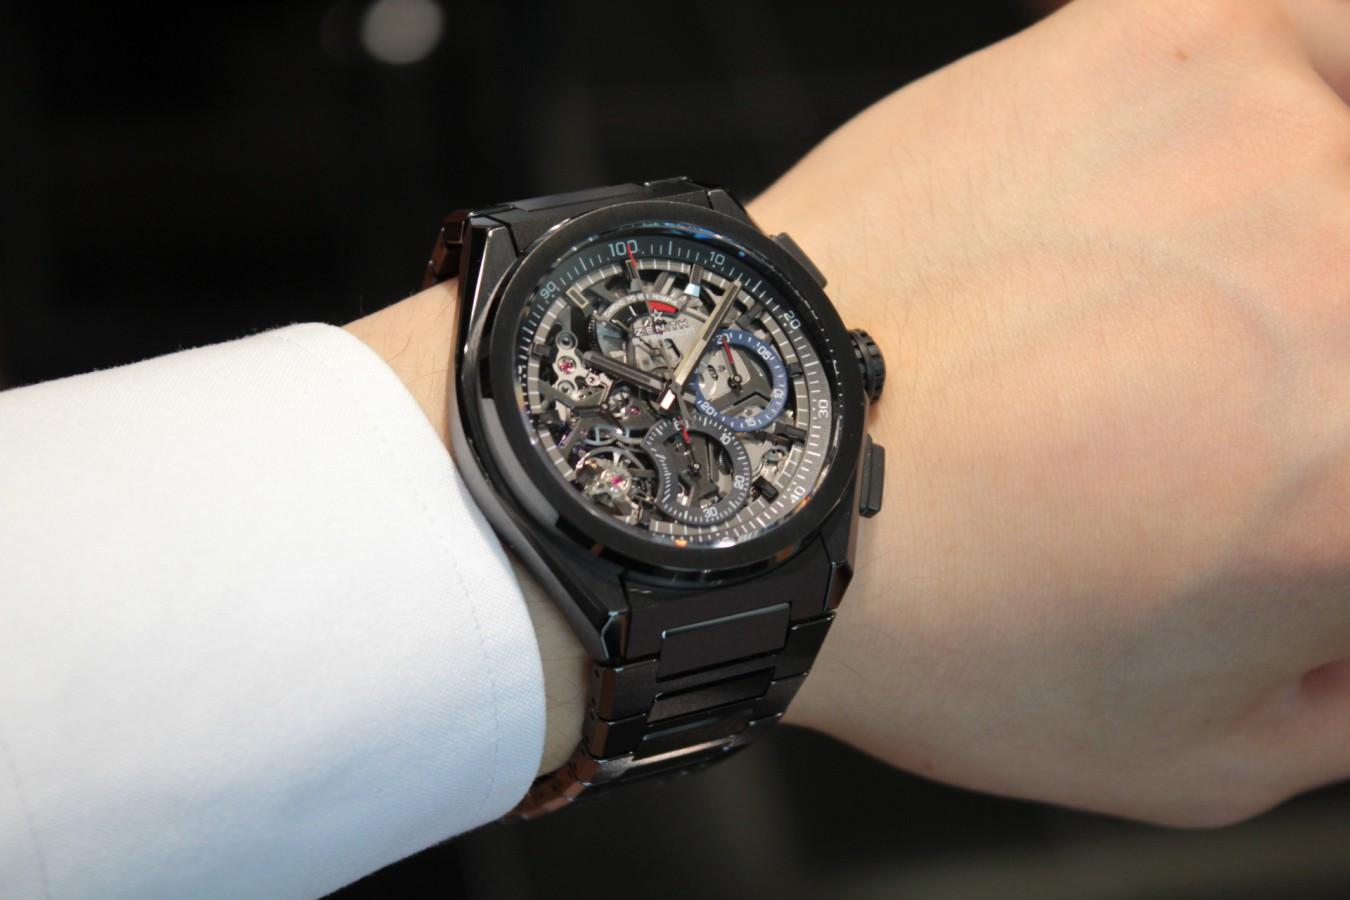 IMG_2752 高級感のあるブラックモデル【デファイ エル・プリメロ21】 - DEFY